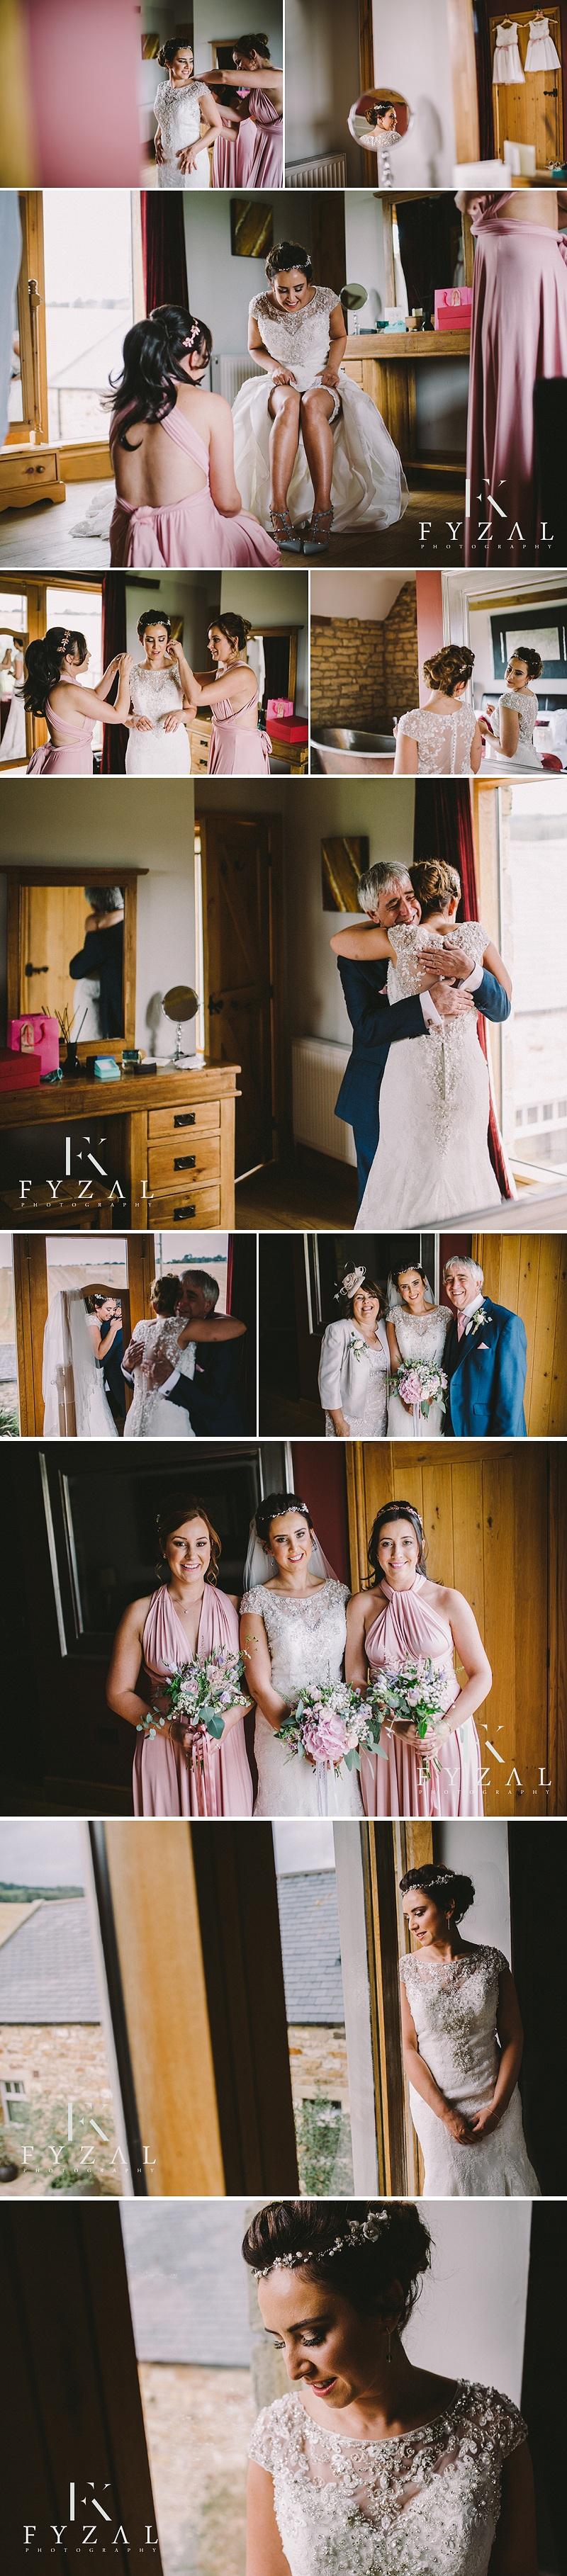 160924-Stacey-Tom-Wedding-03.jpg